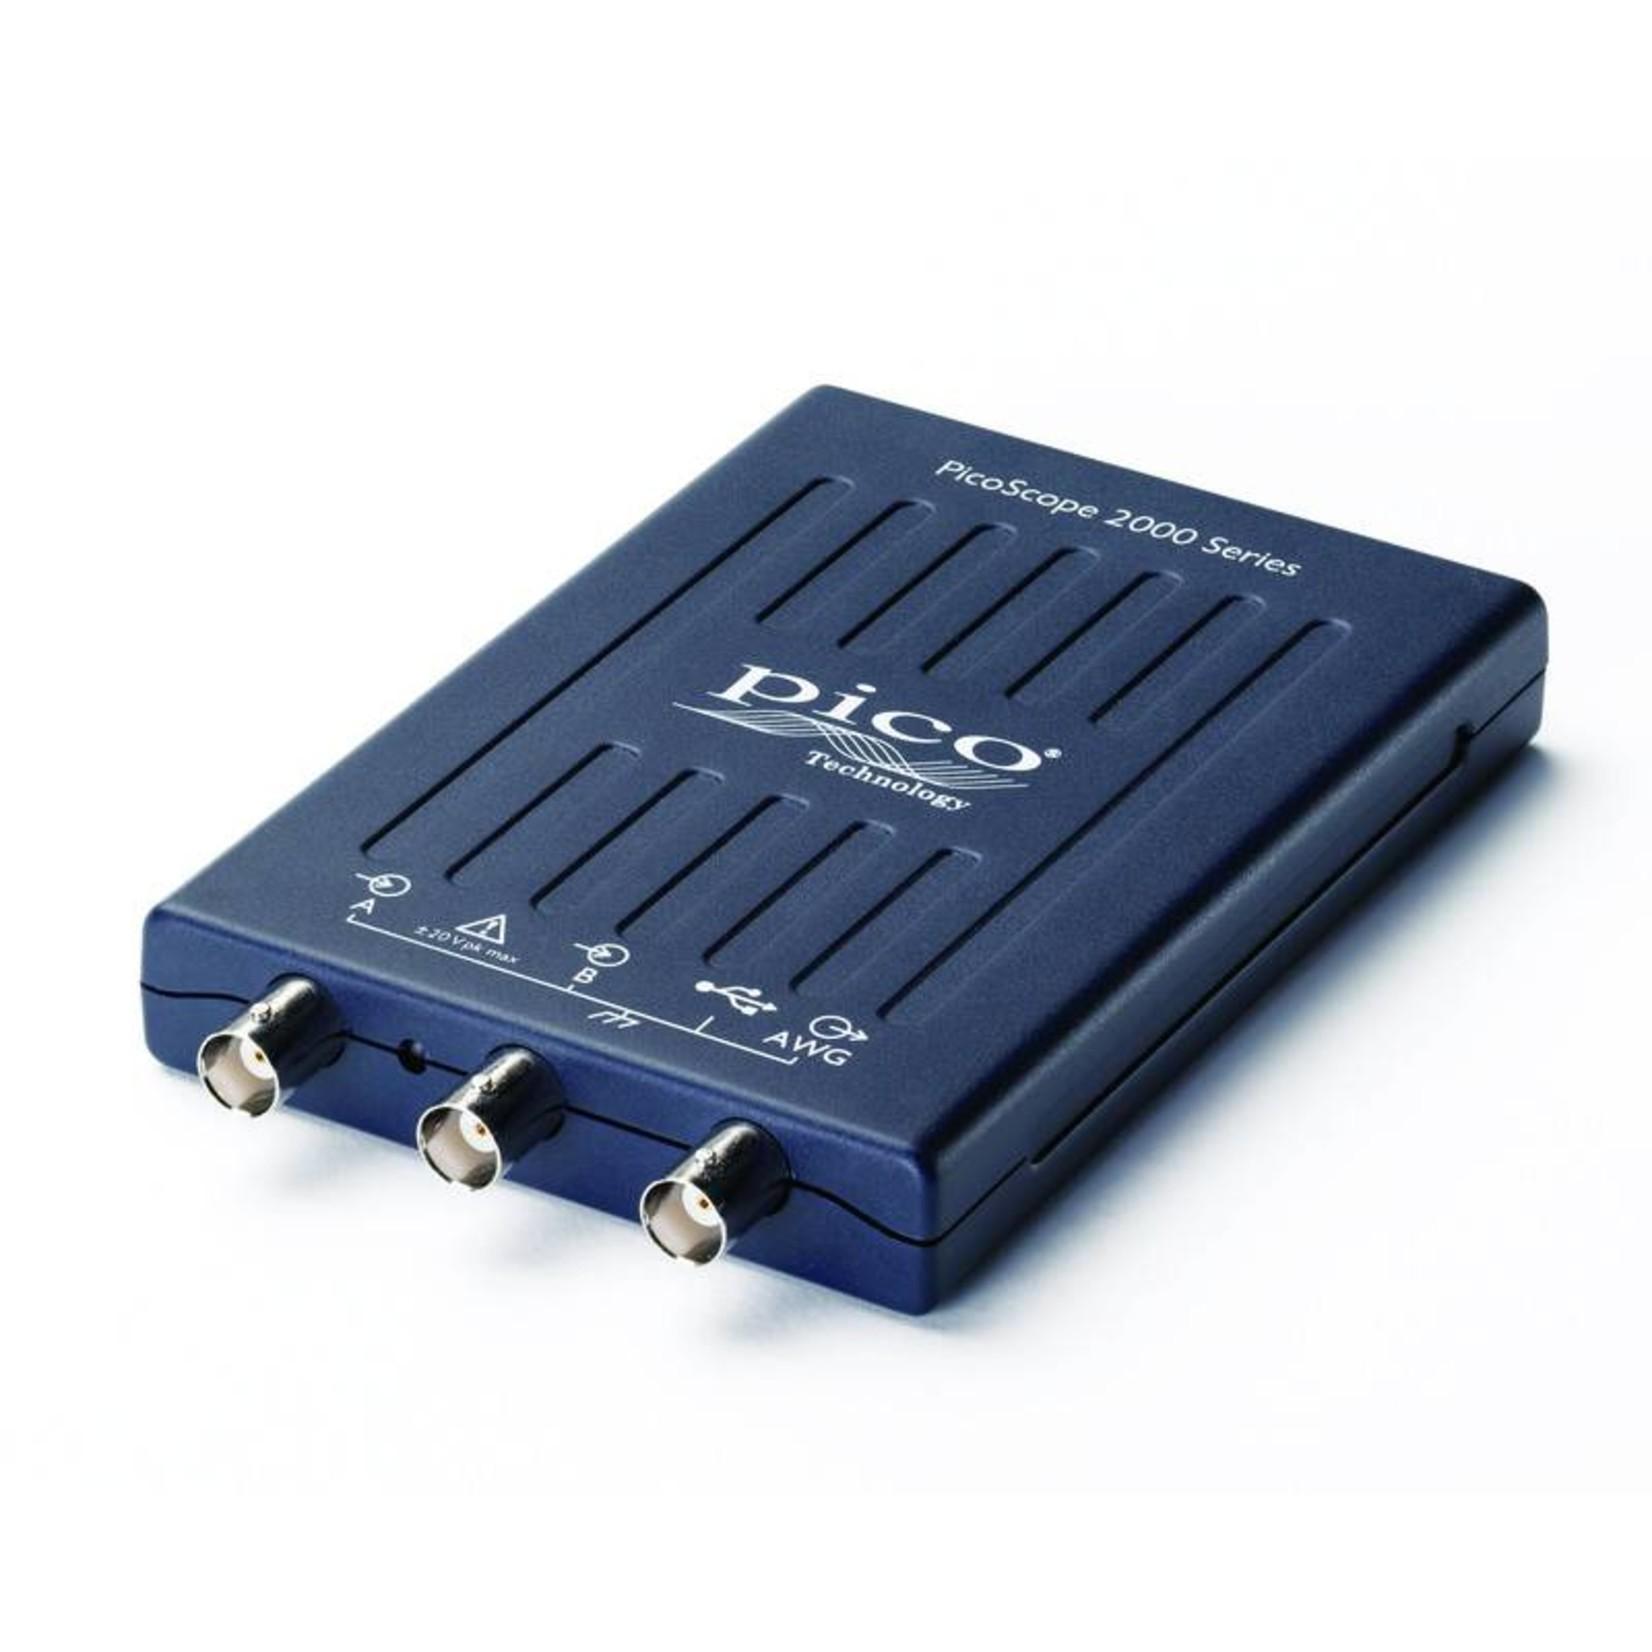 PicoTech PicoScope 2204A - 10 MHz - 2 kanalen - zonder probes